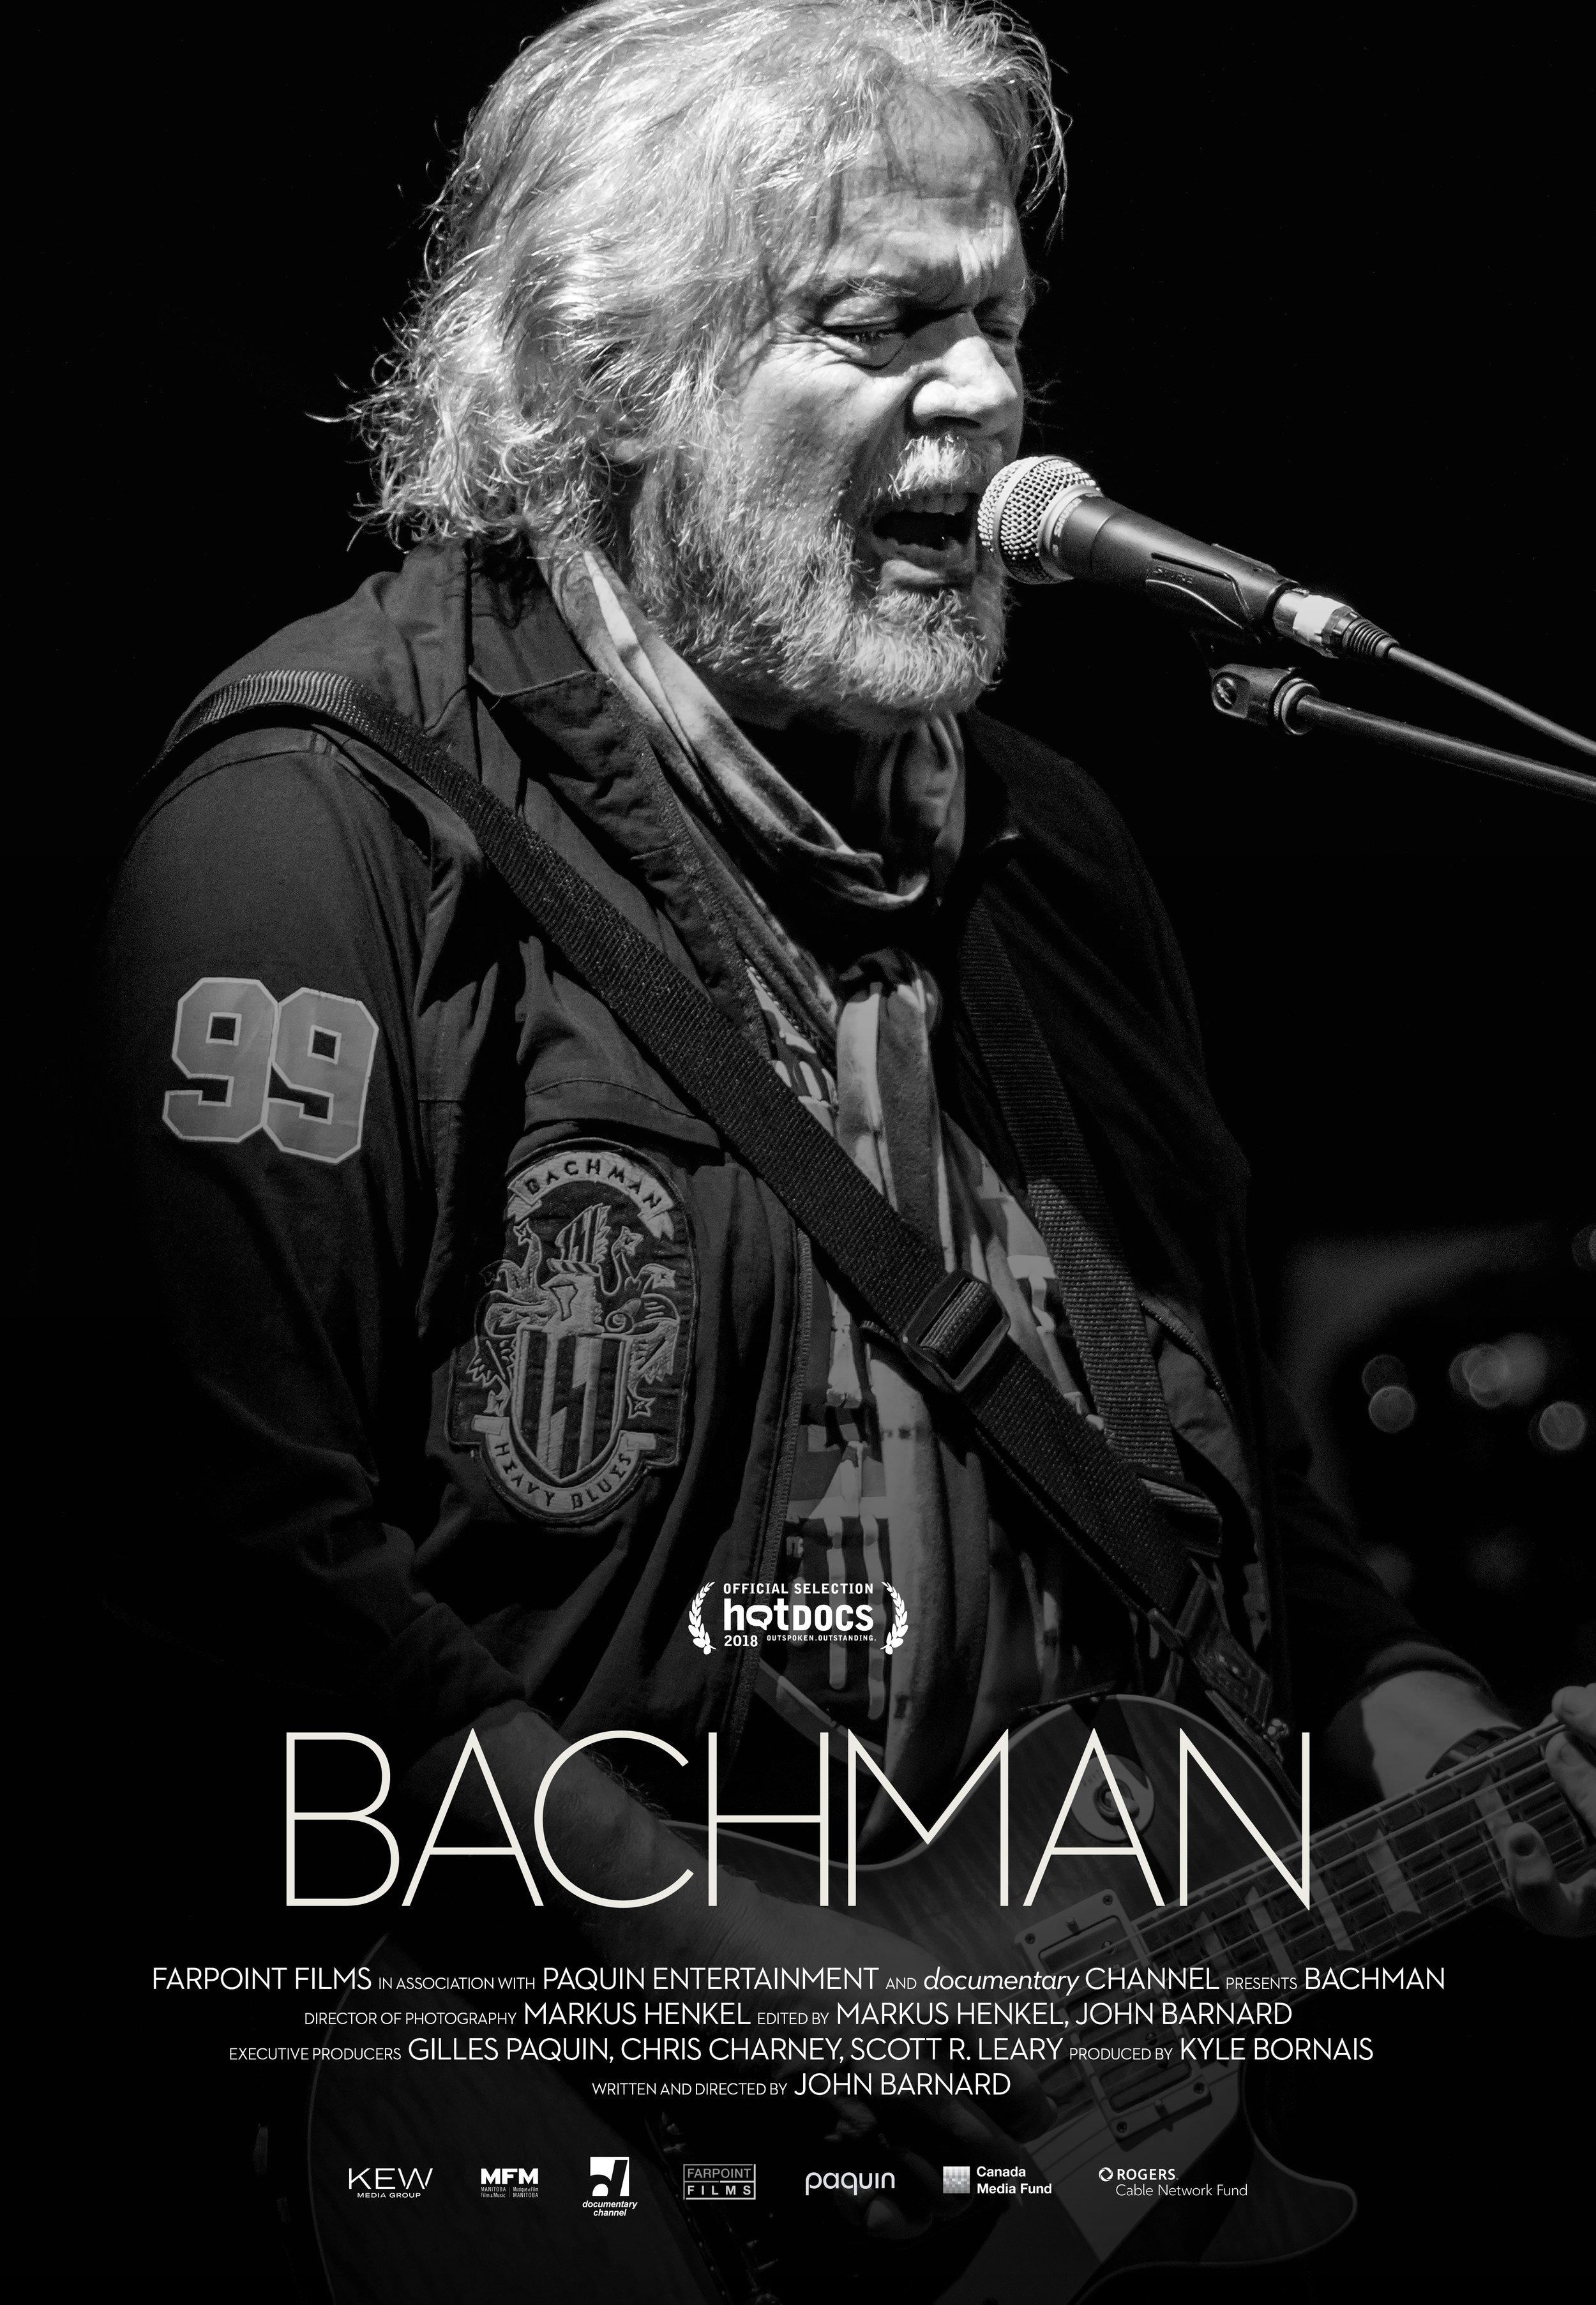 Bachman_poster_27x39.jpg